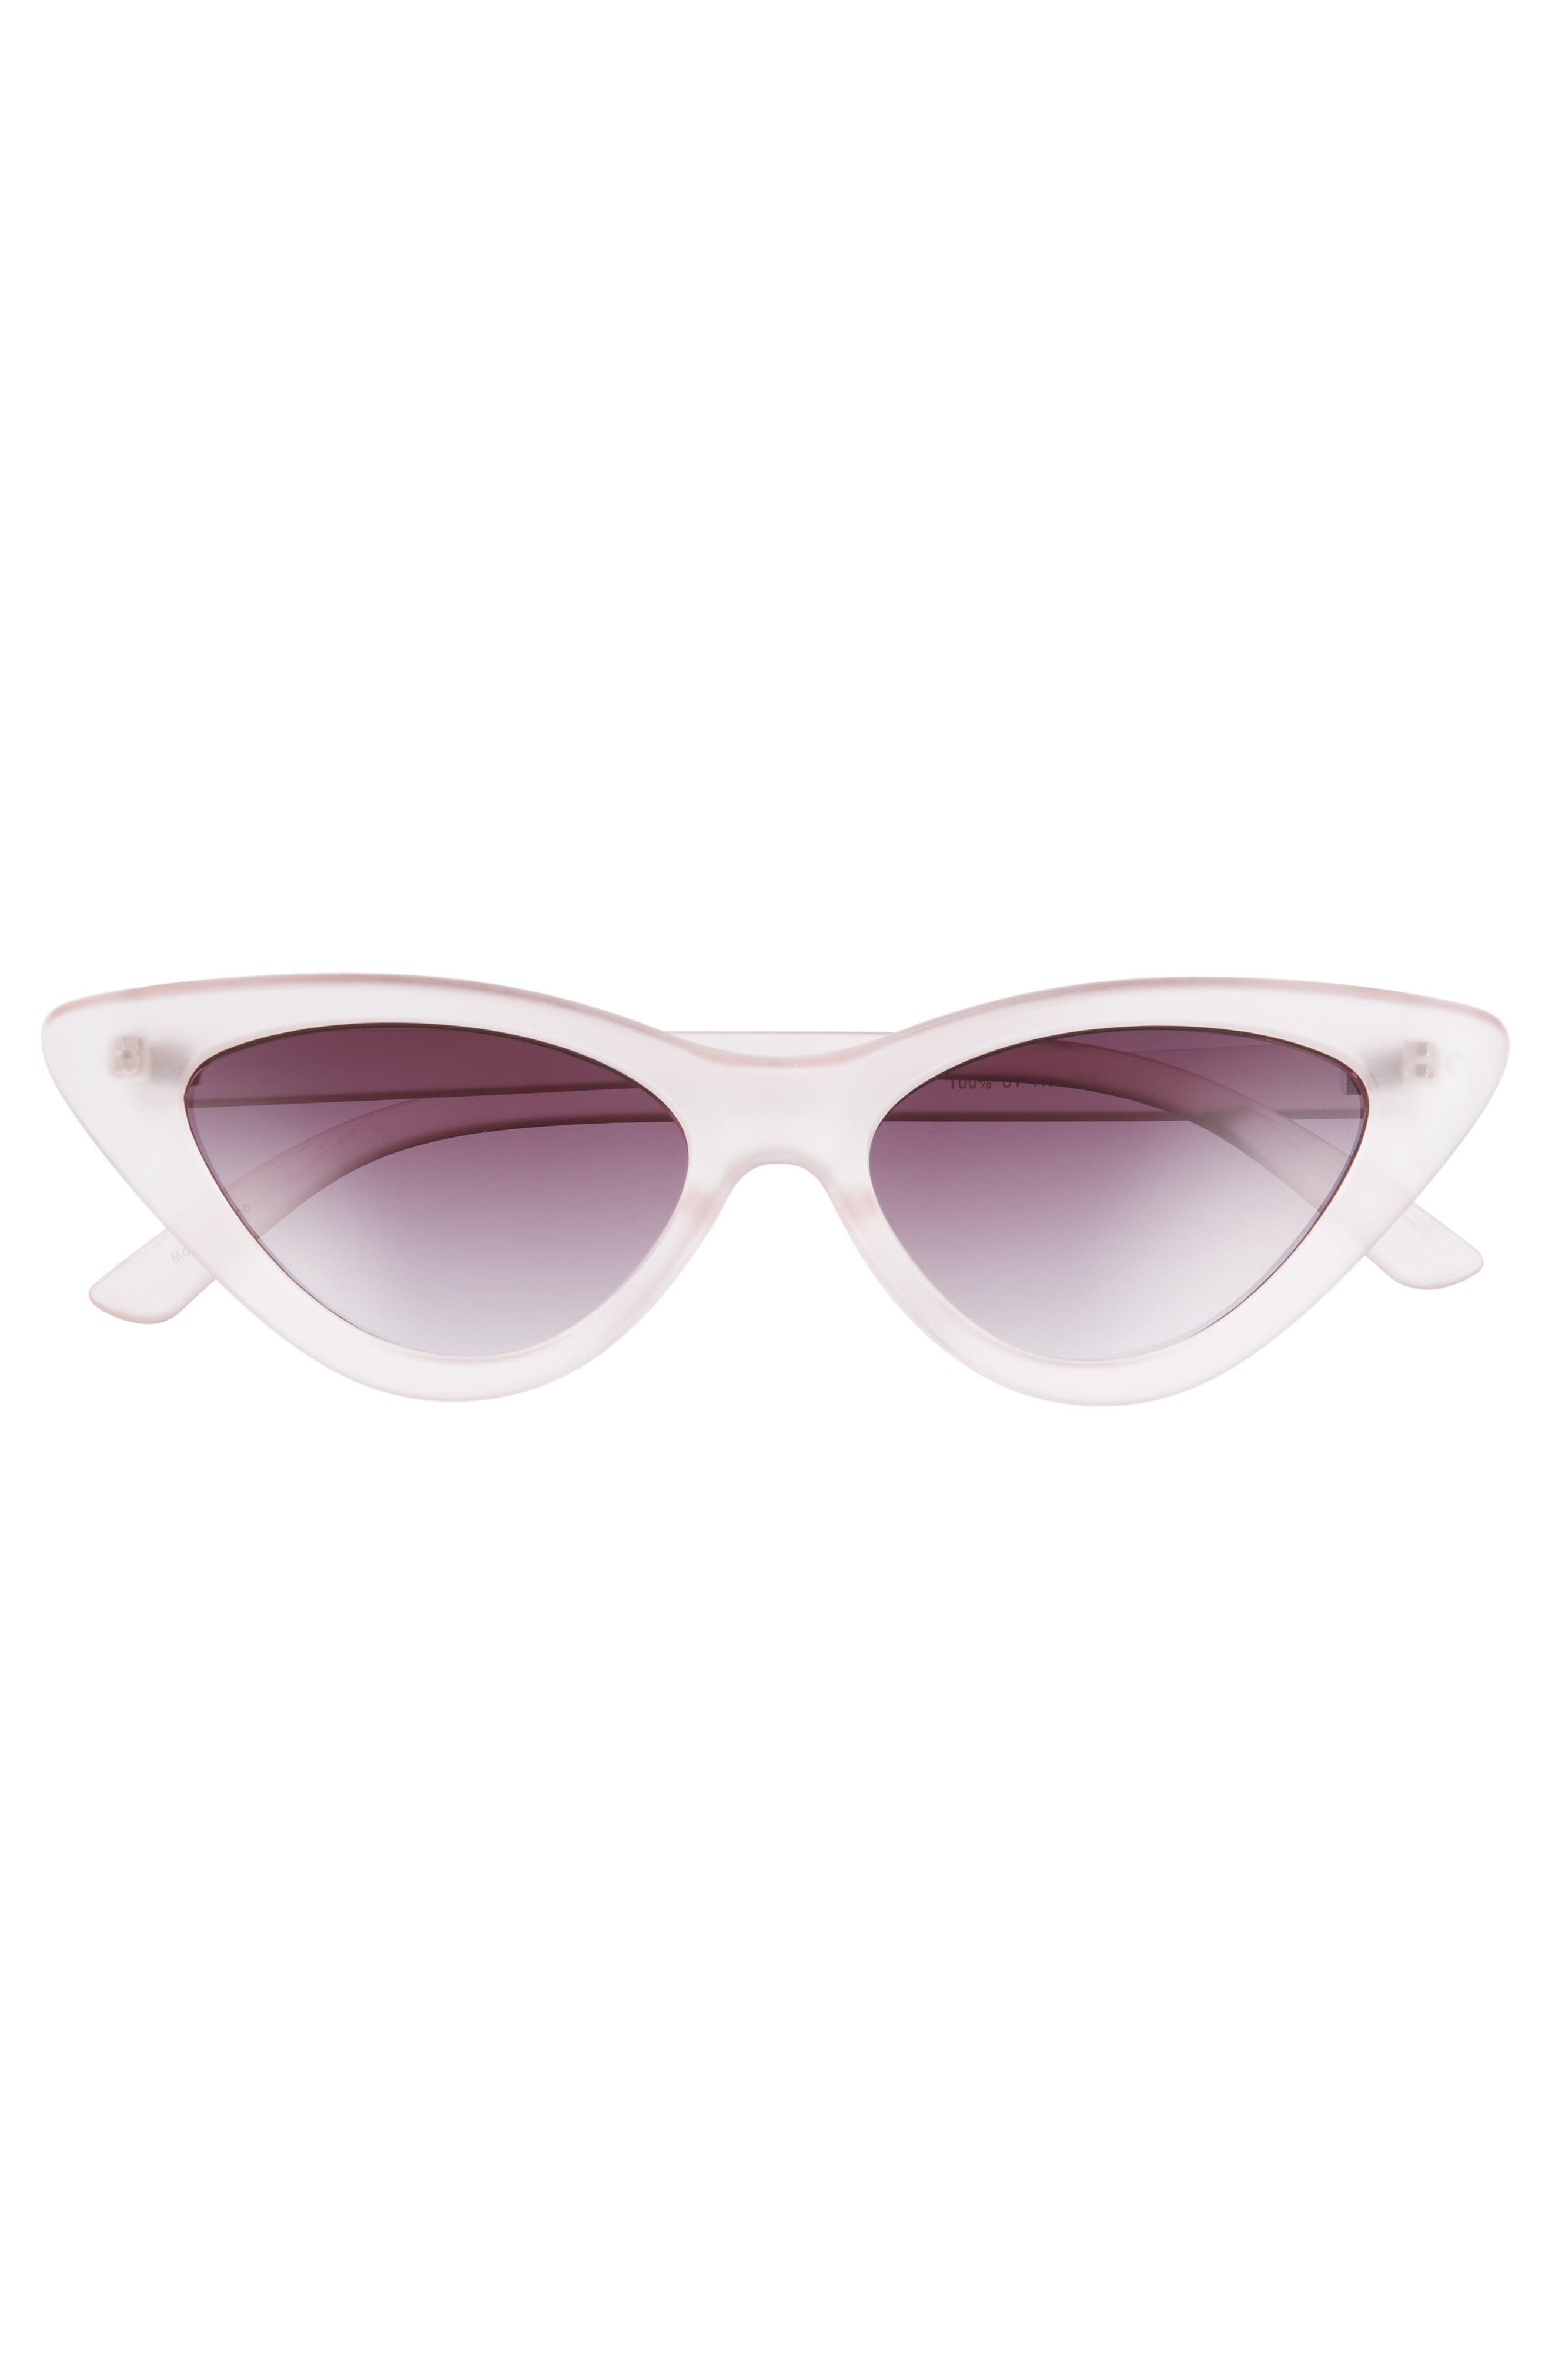 62mm Cat Eye Sunglasses,                             Alternate thumbnail 9, color,